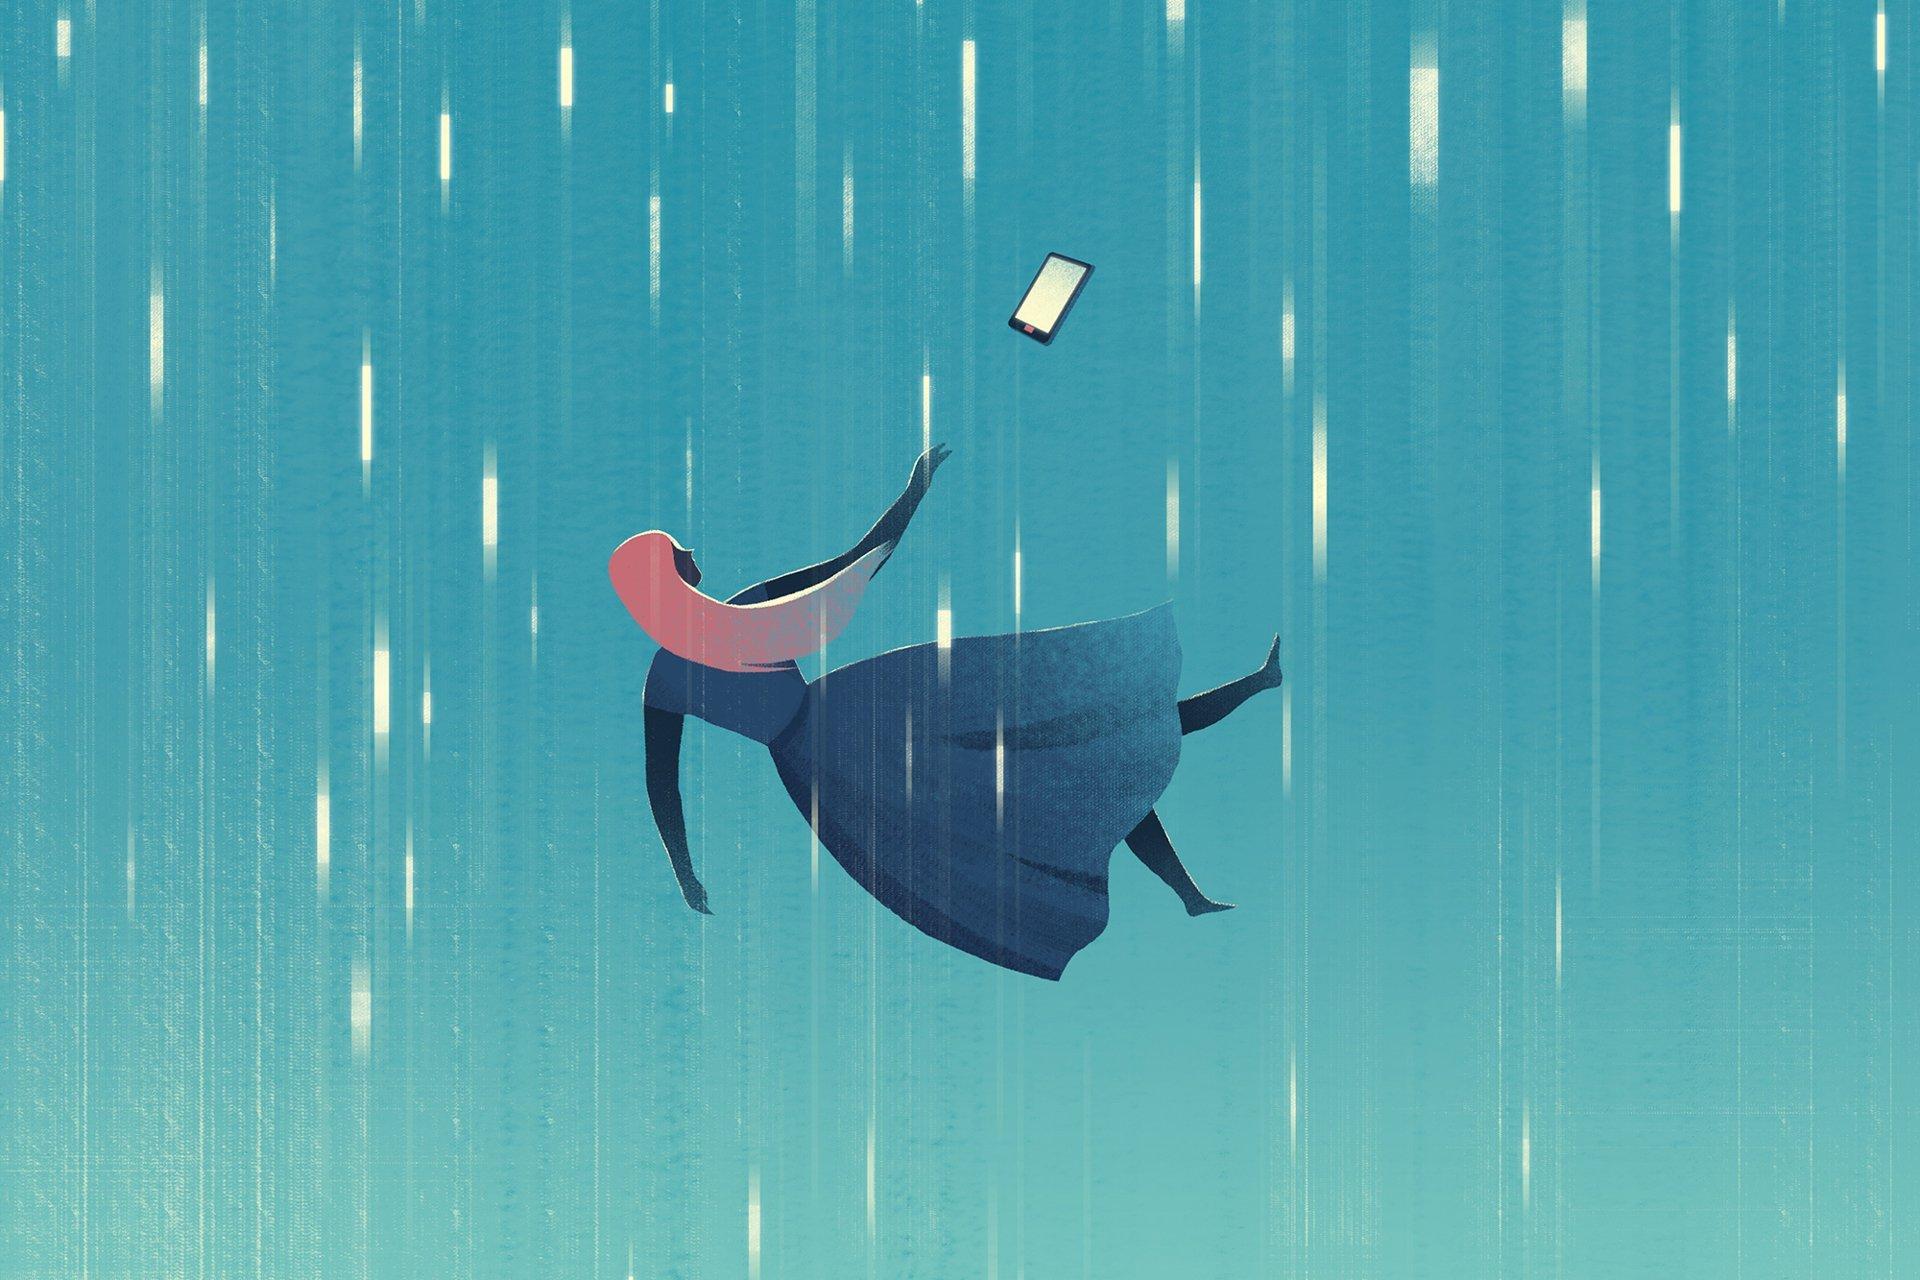 Illustration by Jasu Hu for The Atlantic